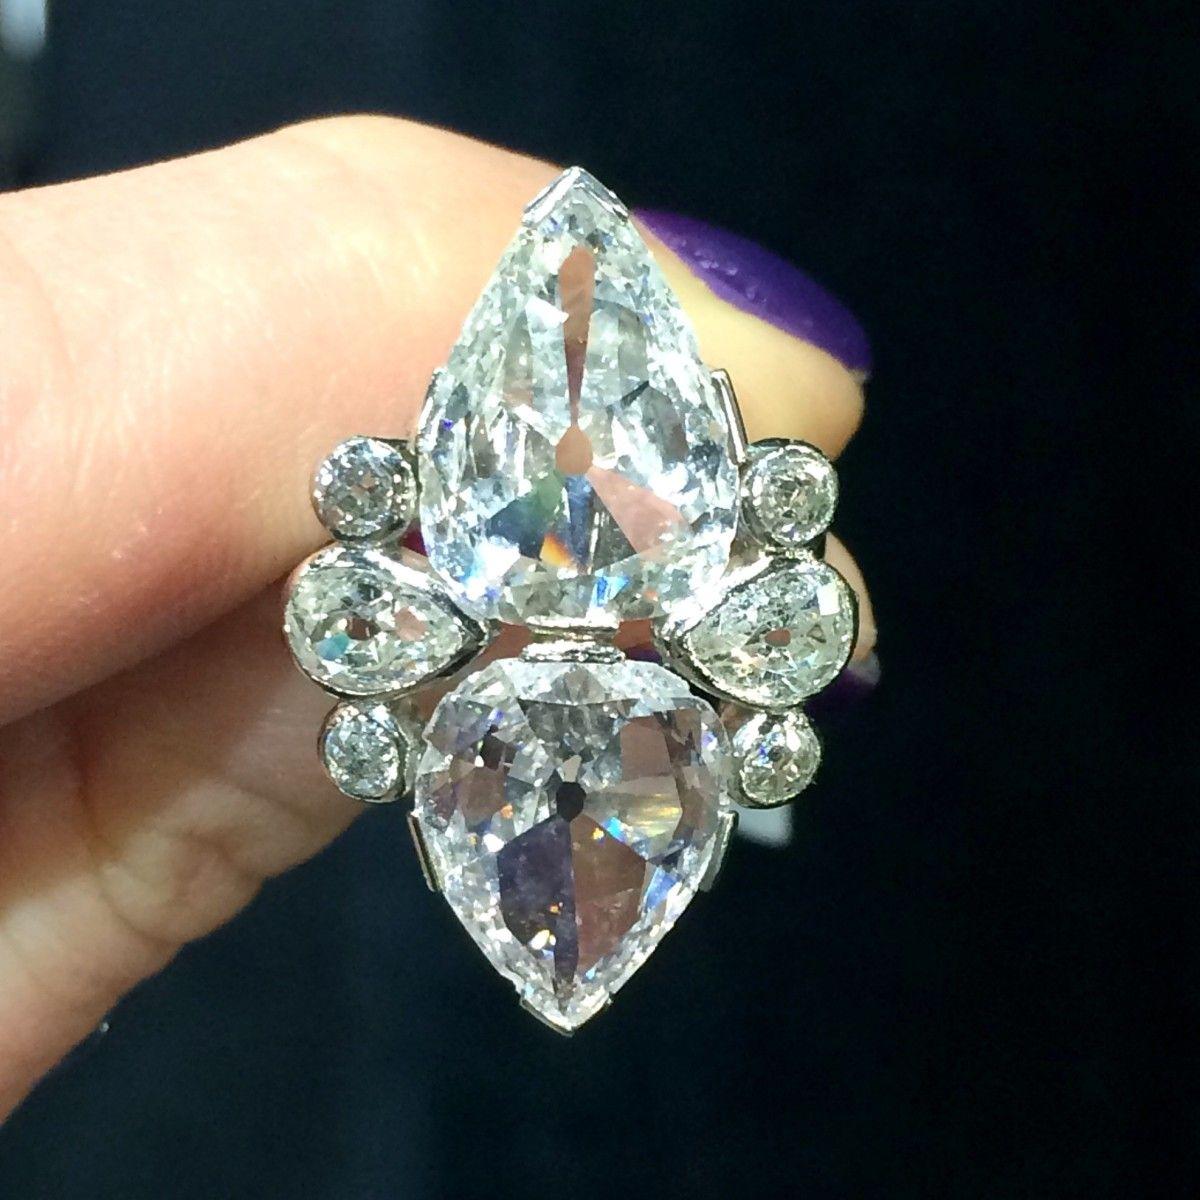 Chaumet diamond ring symbolic chase jewelry part 7 chaumet diamond ring symbolic chase buycottarizona